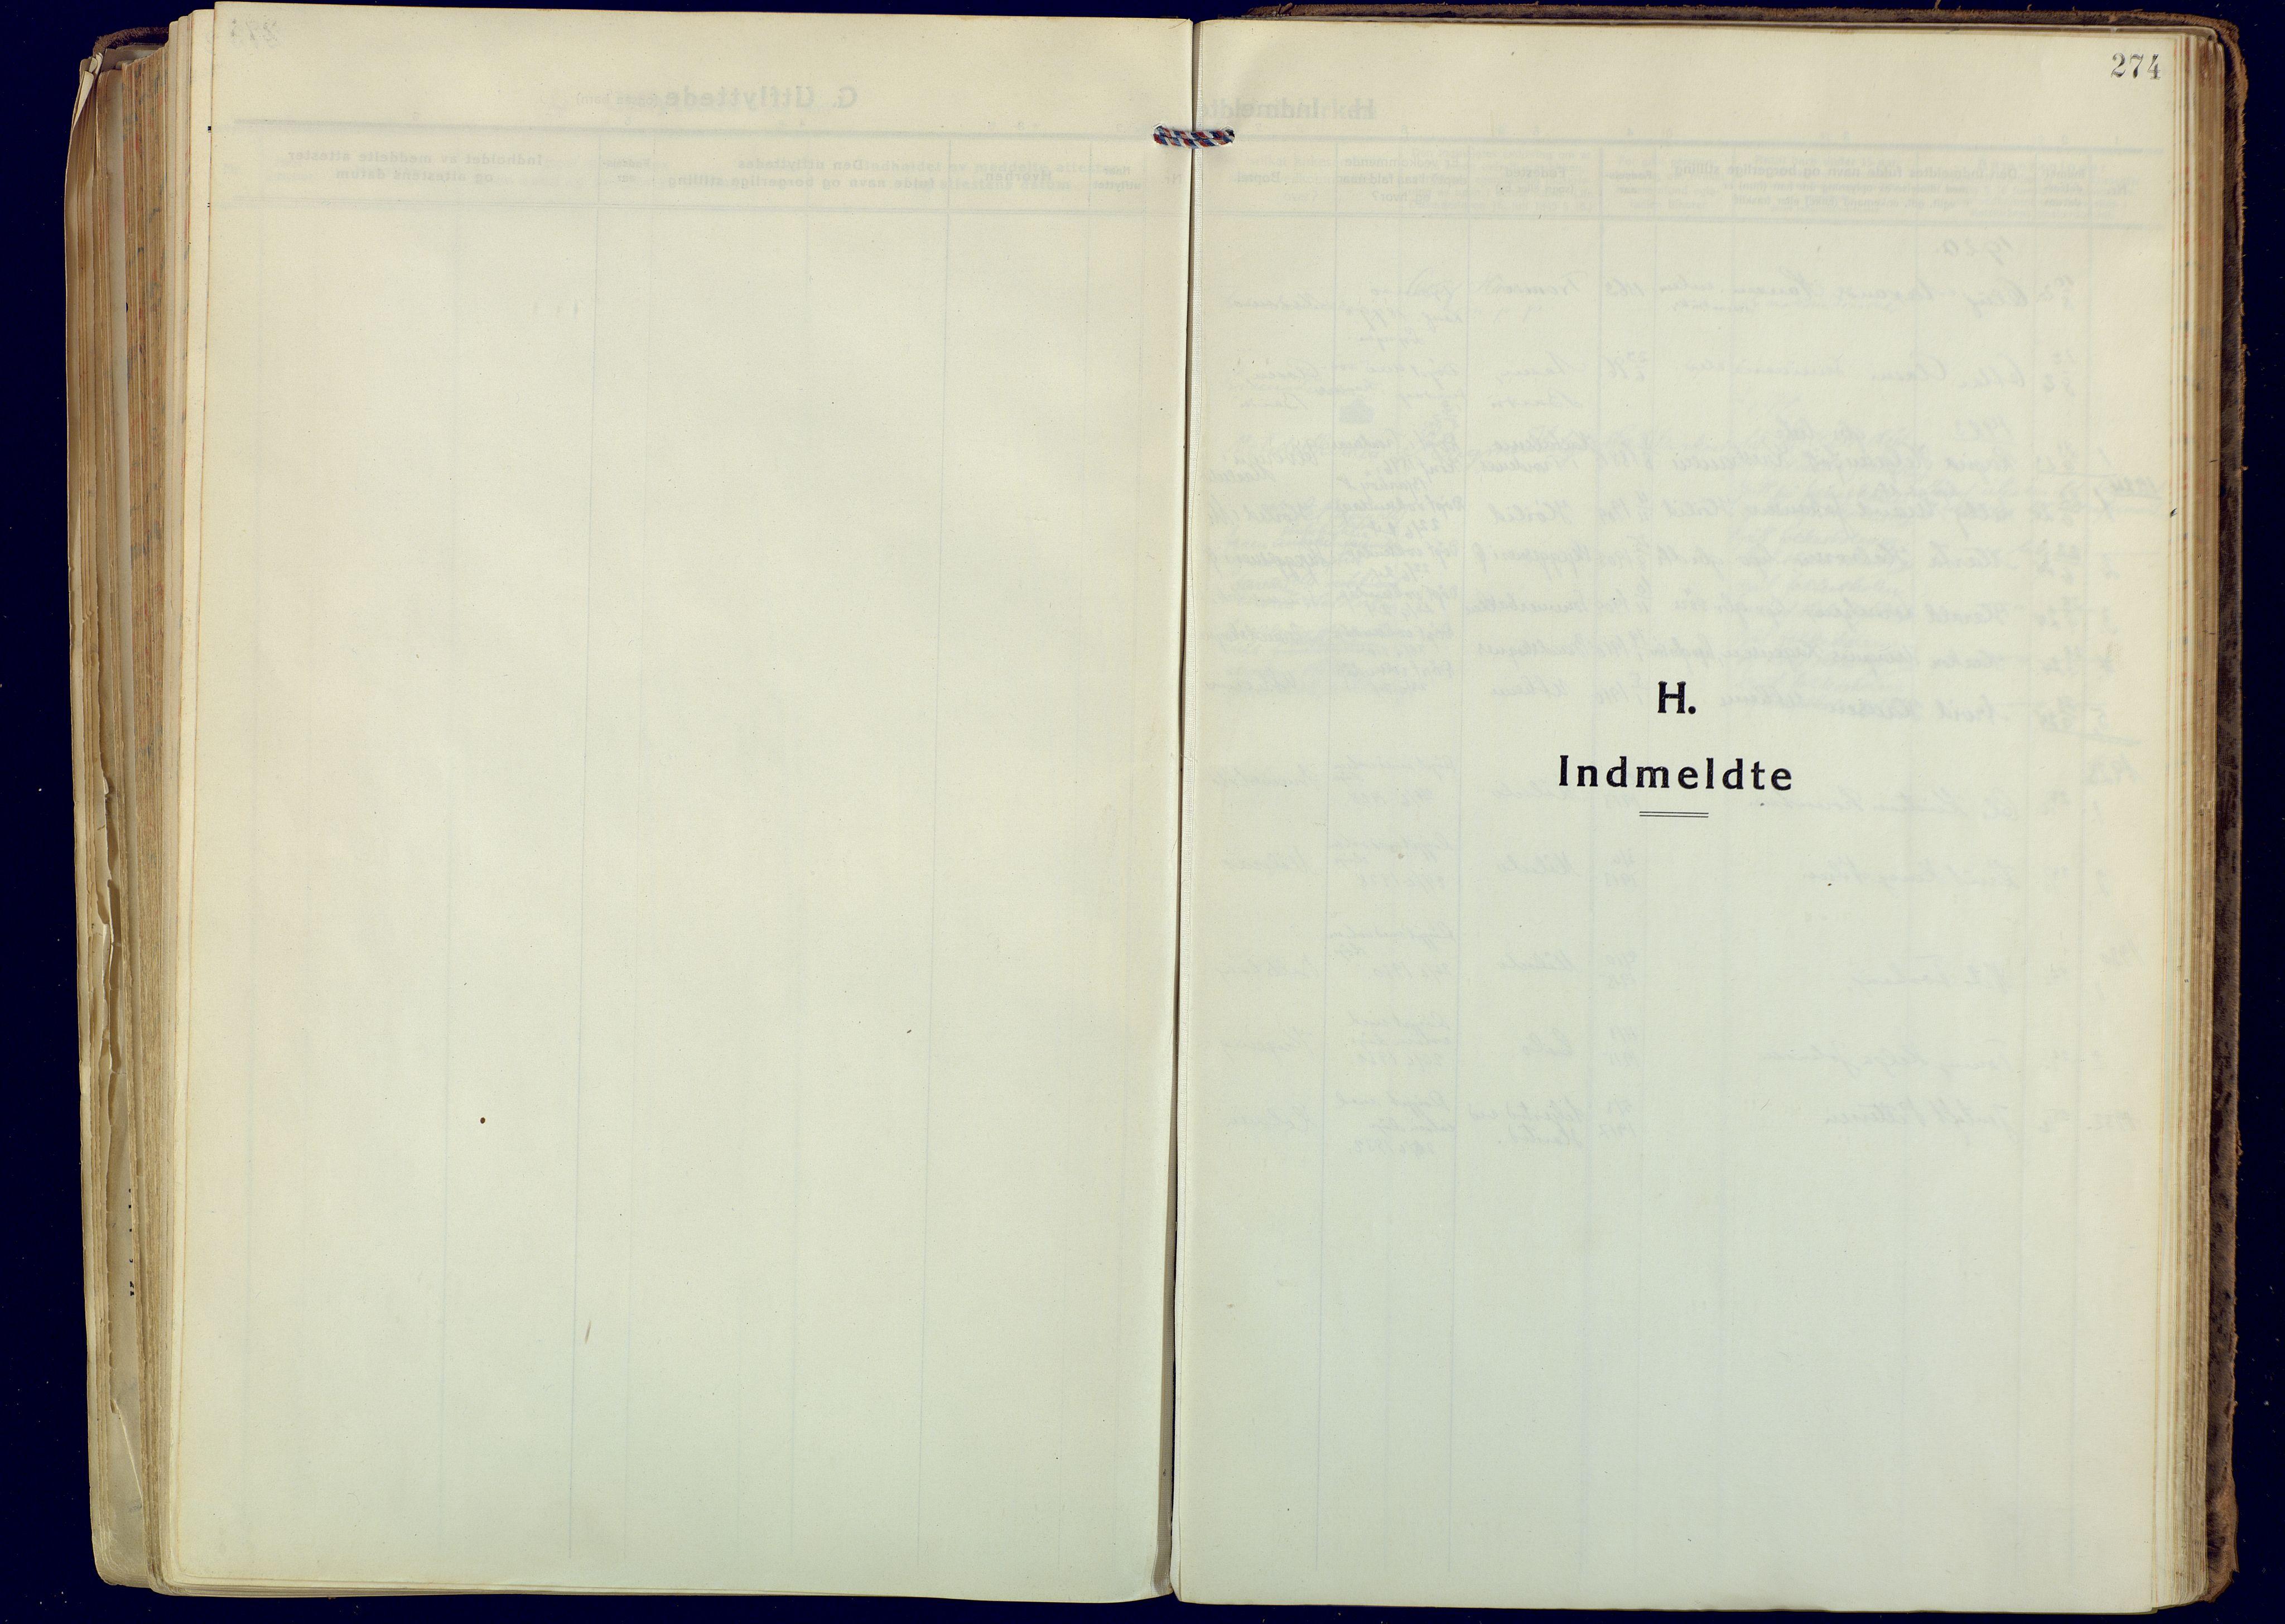 SATØ, Målselv sokneprestembete, Ministerialbok nr. 14, 1919-1932, s. 274